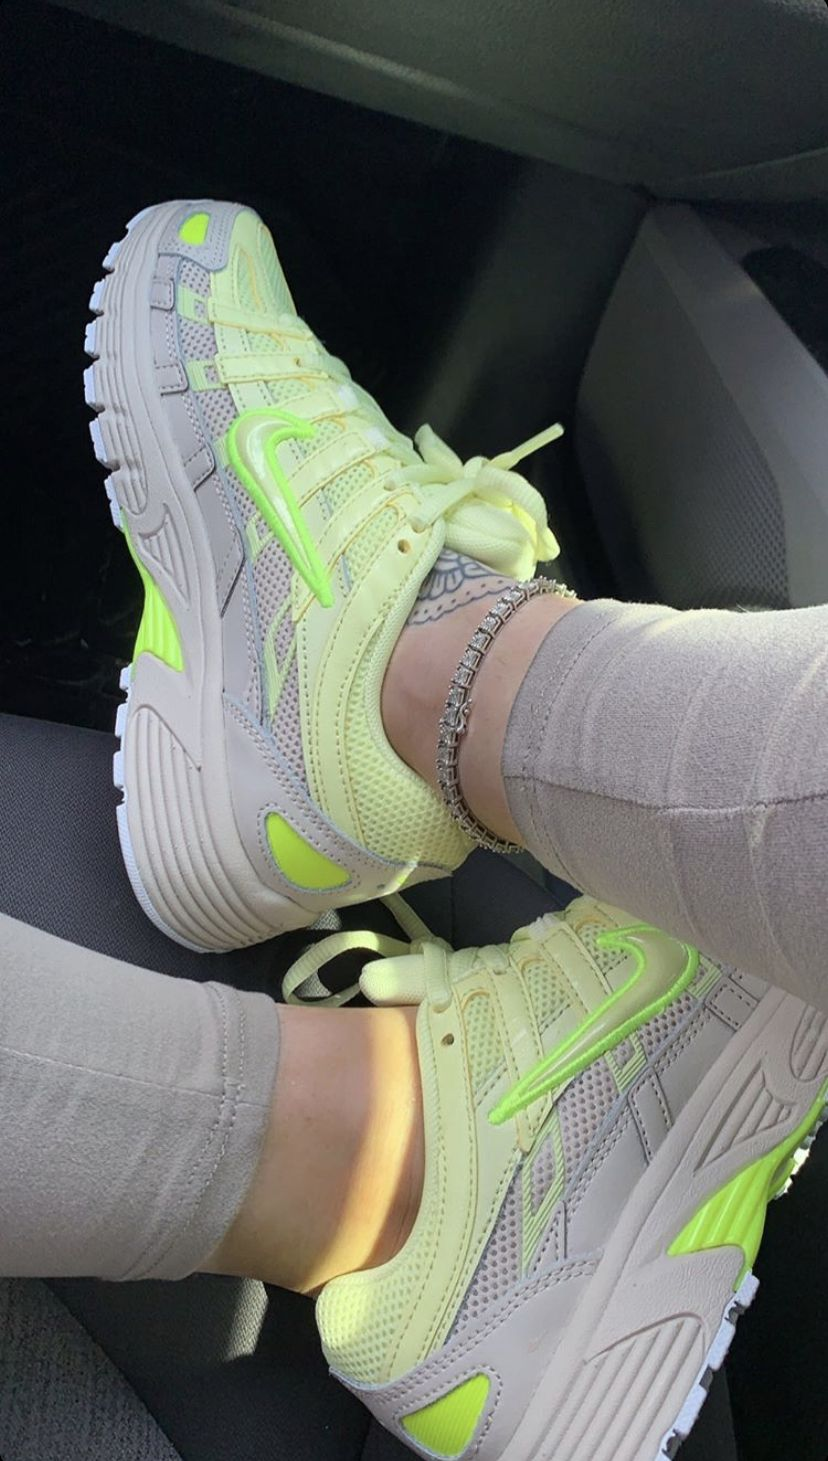 Pin by Jacqueline Perez on Killin kicks!!! | Kicks shoes